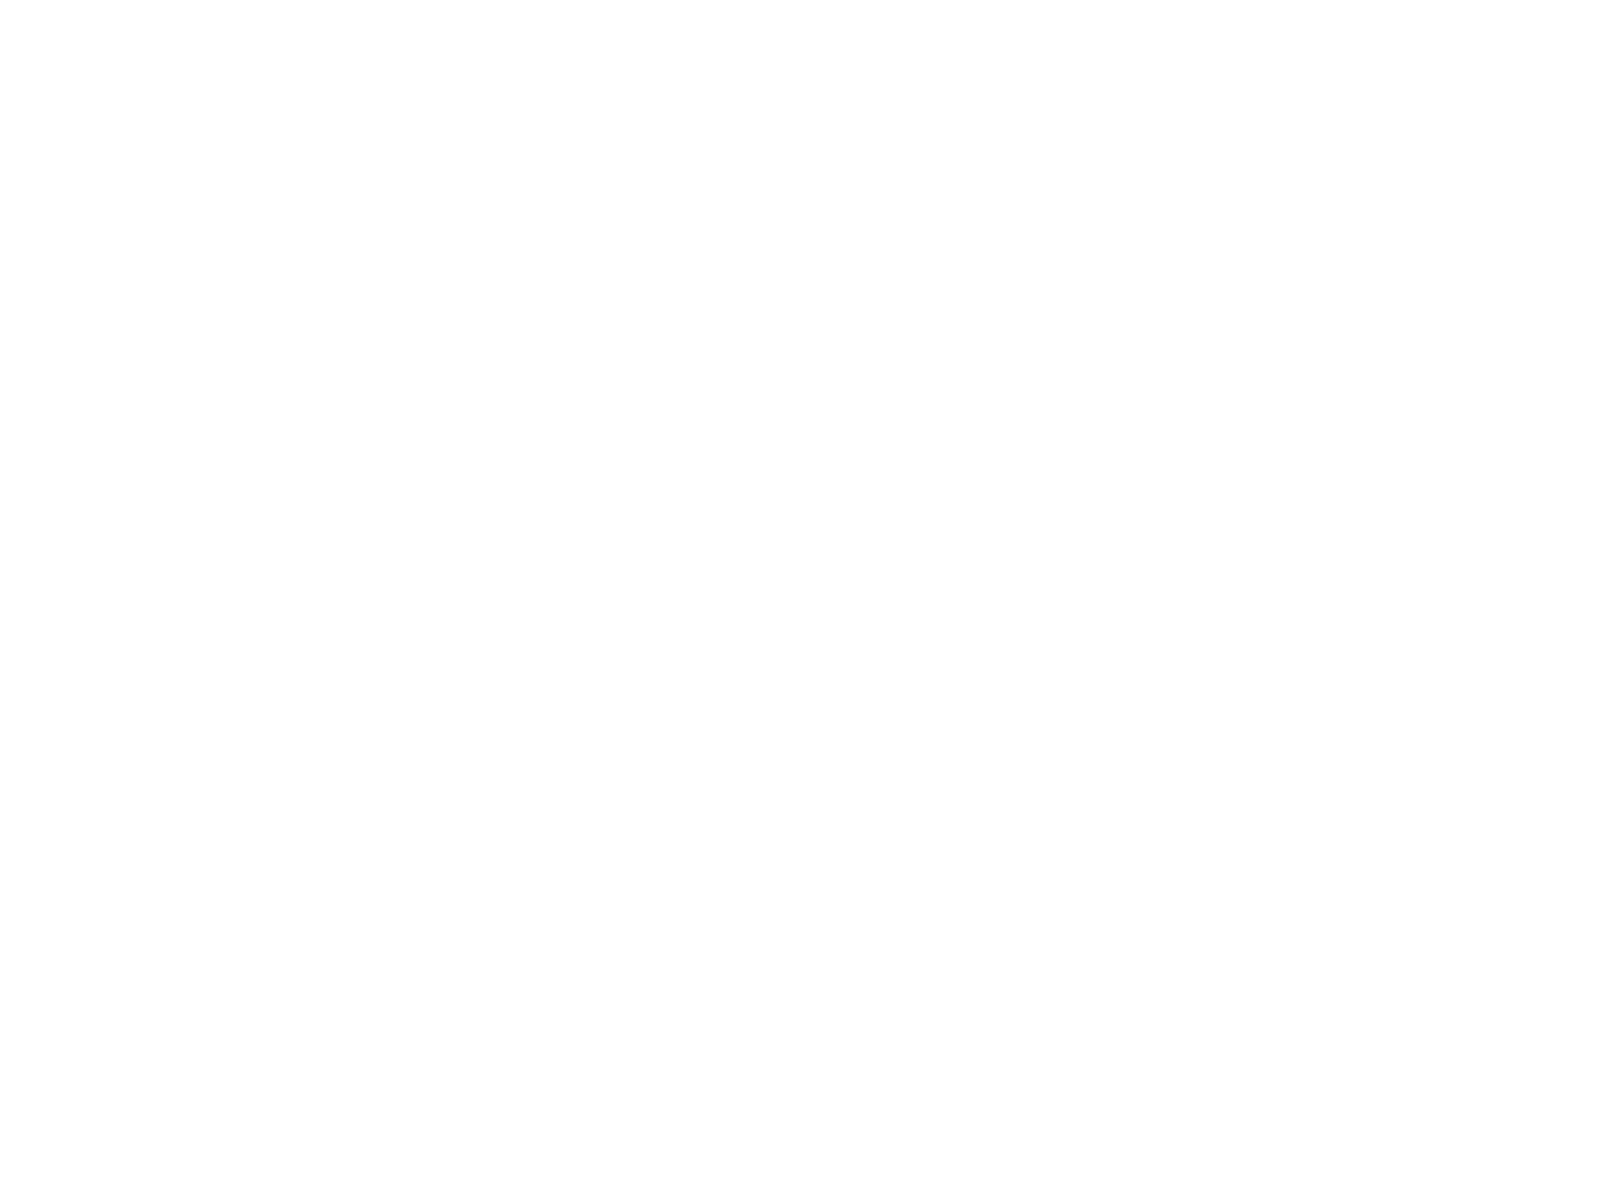 Fundación Municipal de Cultura